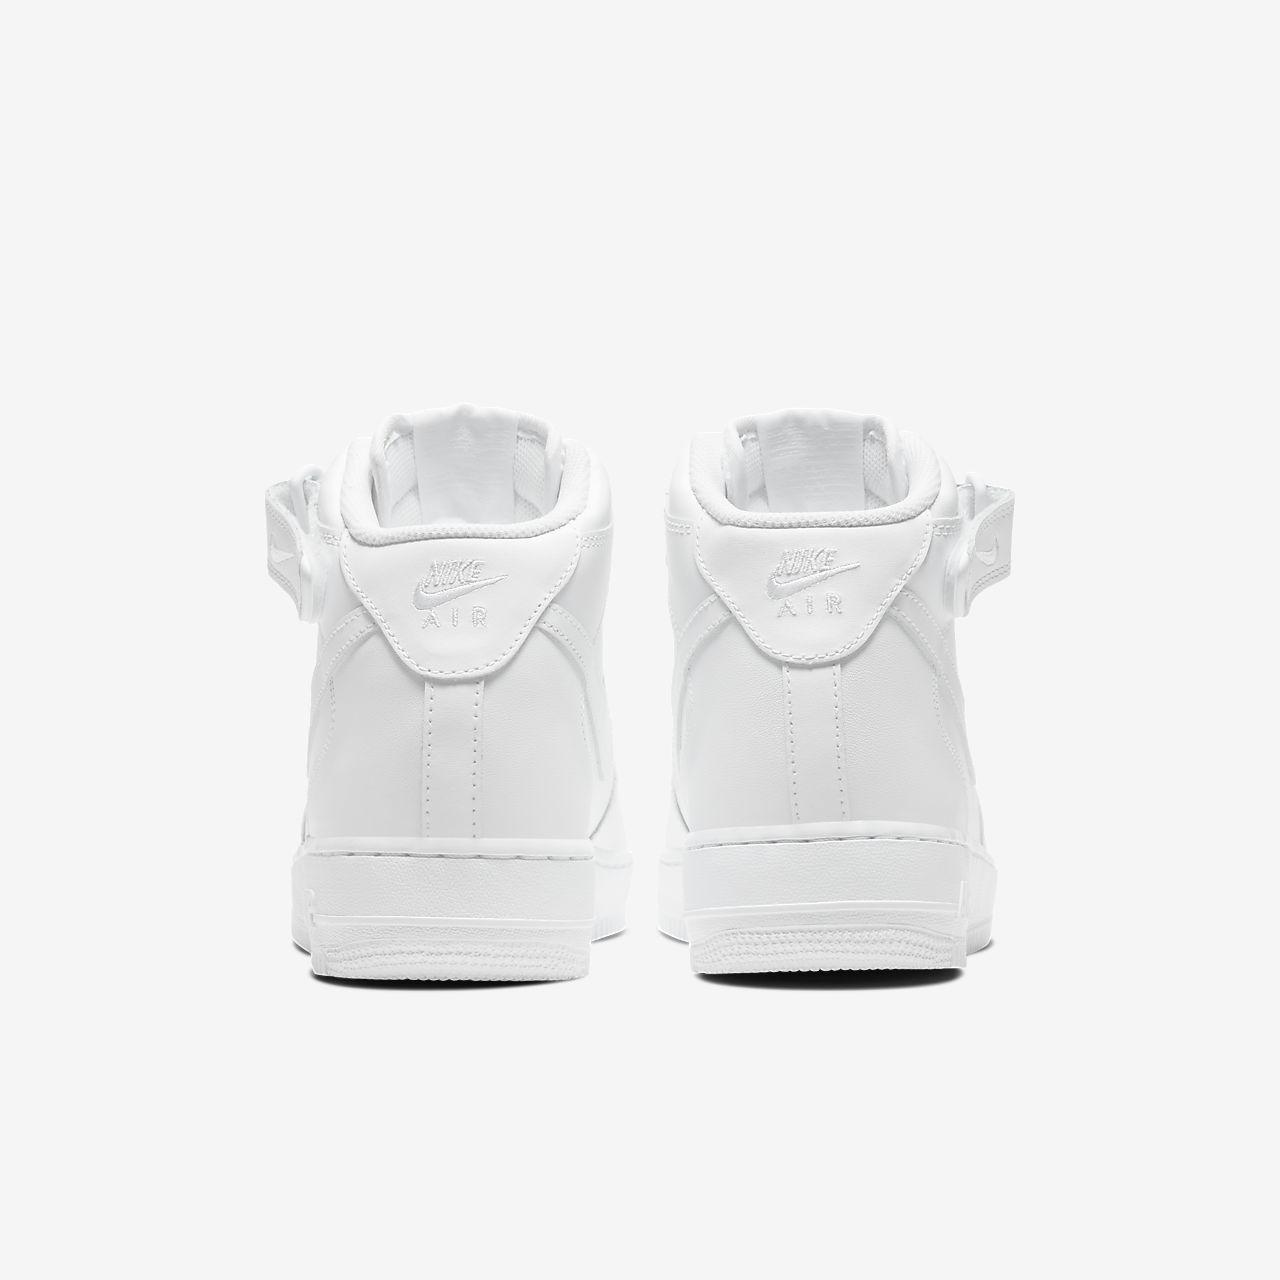 big sale d0b7b 04793 Nike Air Force 1 Mid '07 Men's Shoe. Nike.com SE